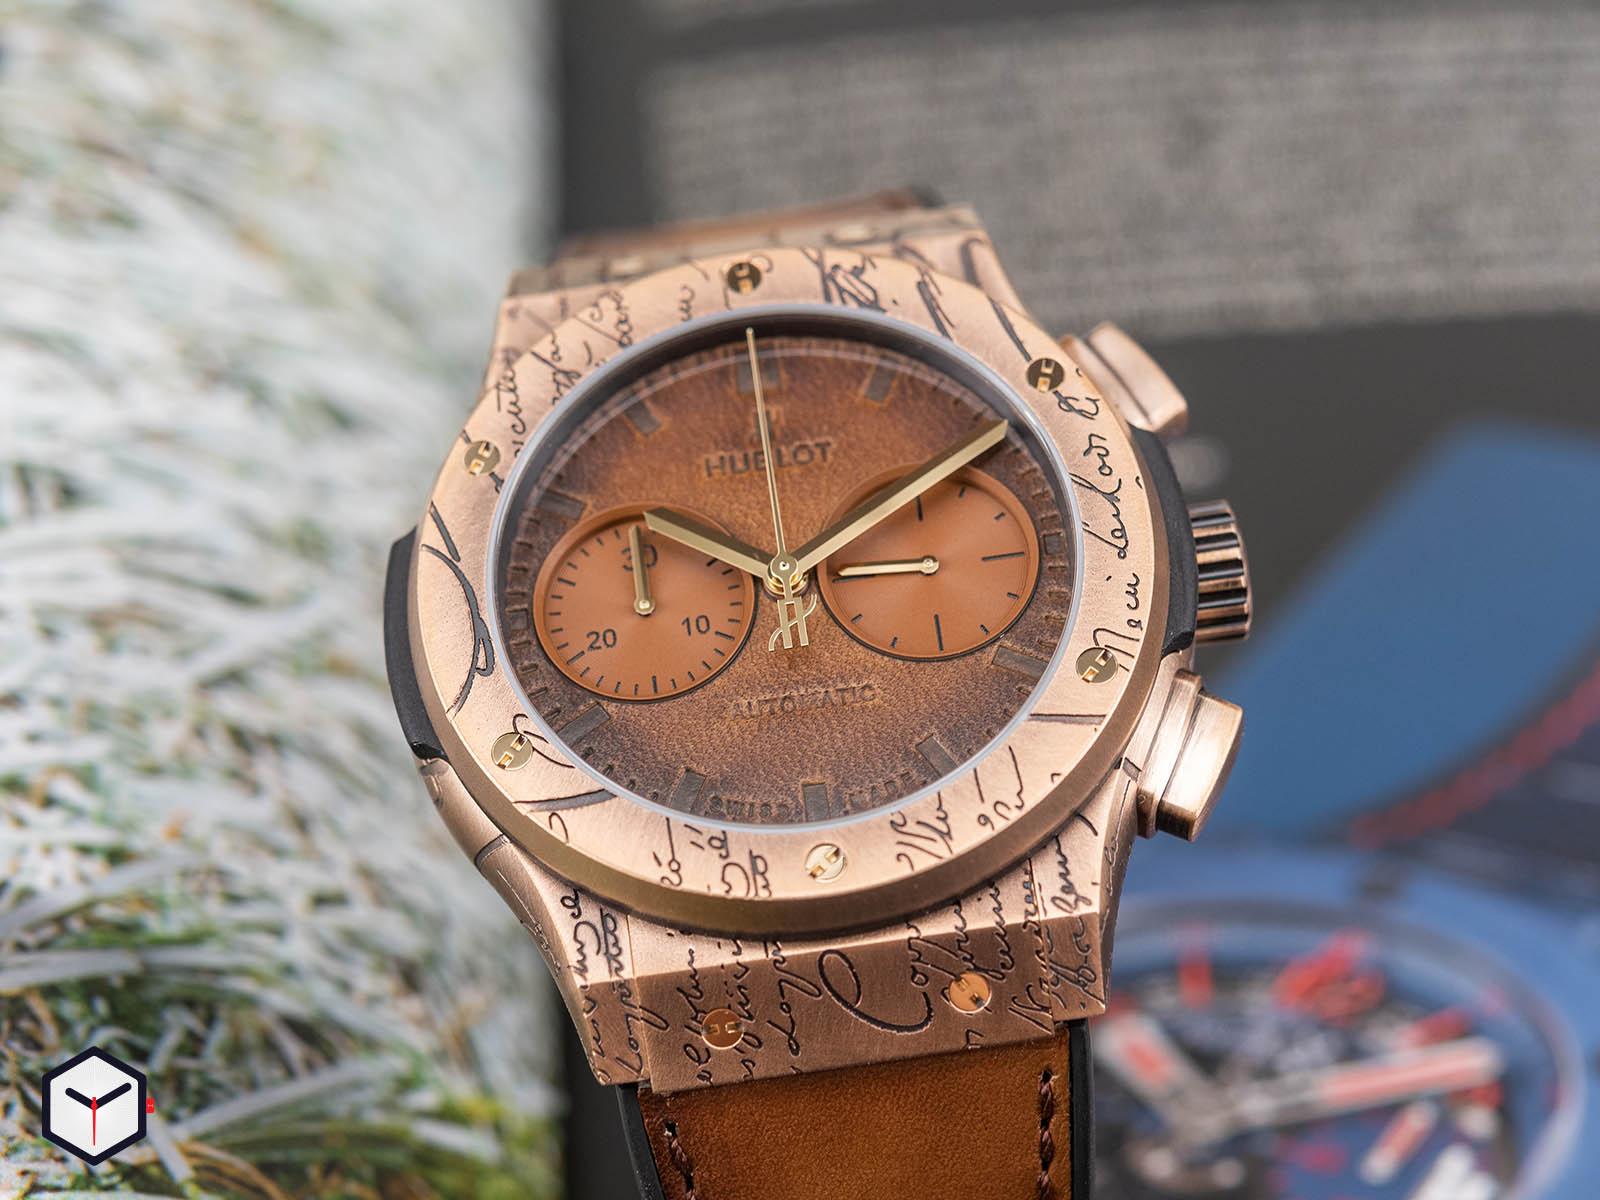 521-bz-05ig-vr-ber19-hublot-classic-fusion-chronograph-berluti-cold-gold-3.jpg